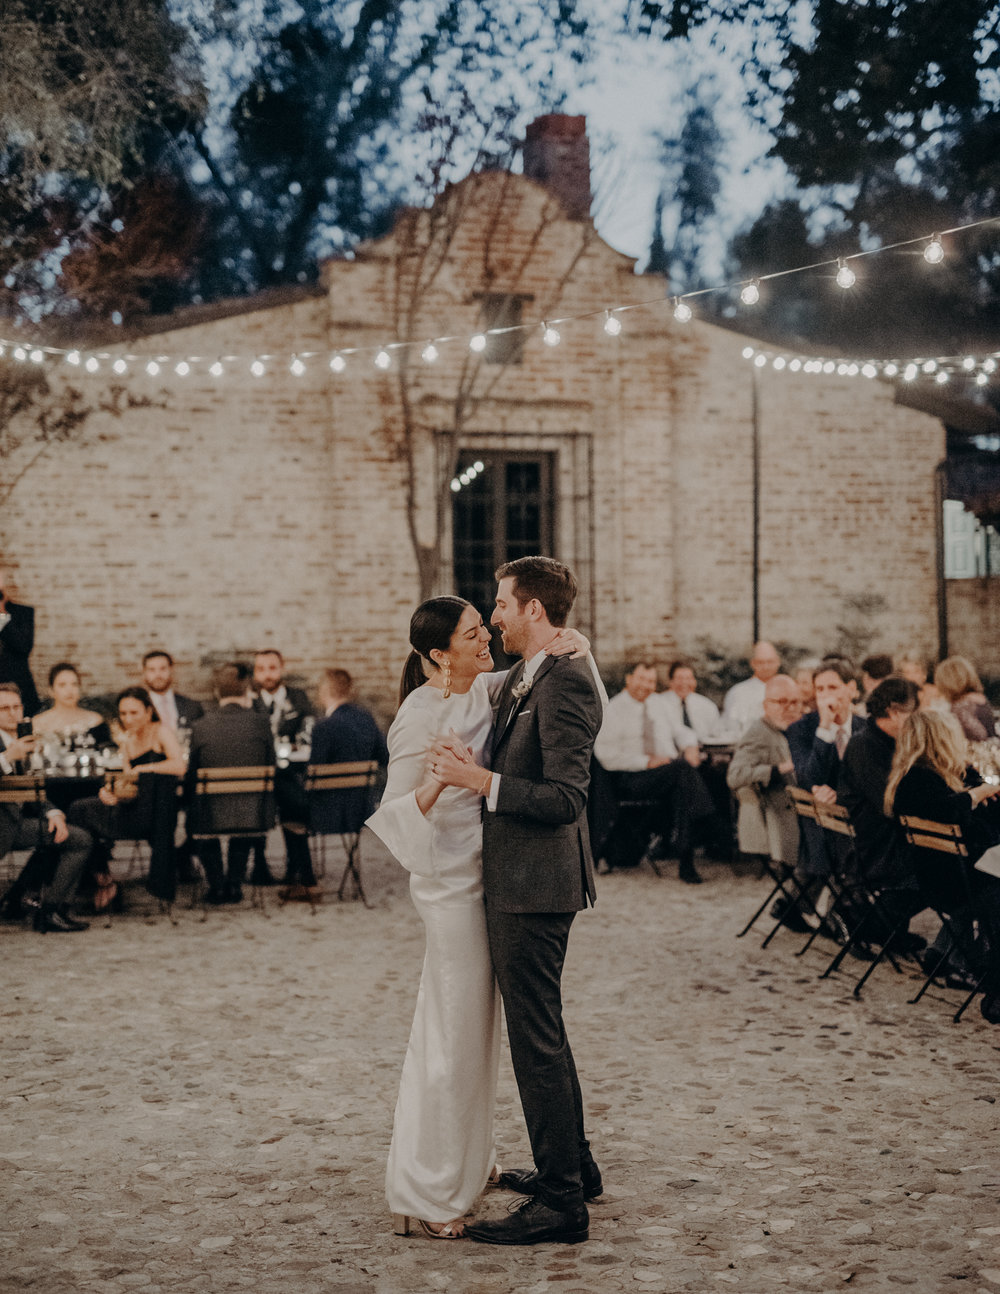 Hummingbird Nest Ranch Wedding - Wedding Photographer in Los Angeles - IsaiahAndTaylor.com-091.jpg